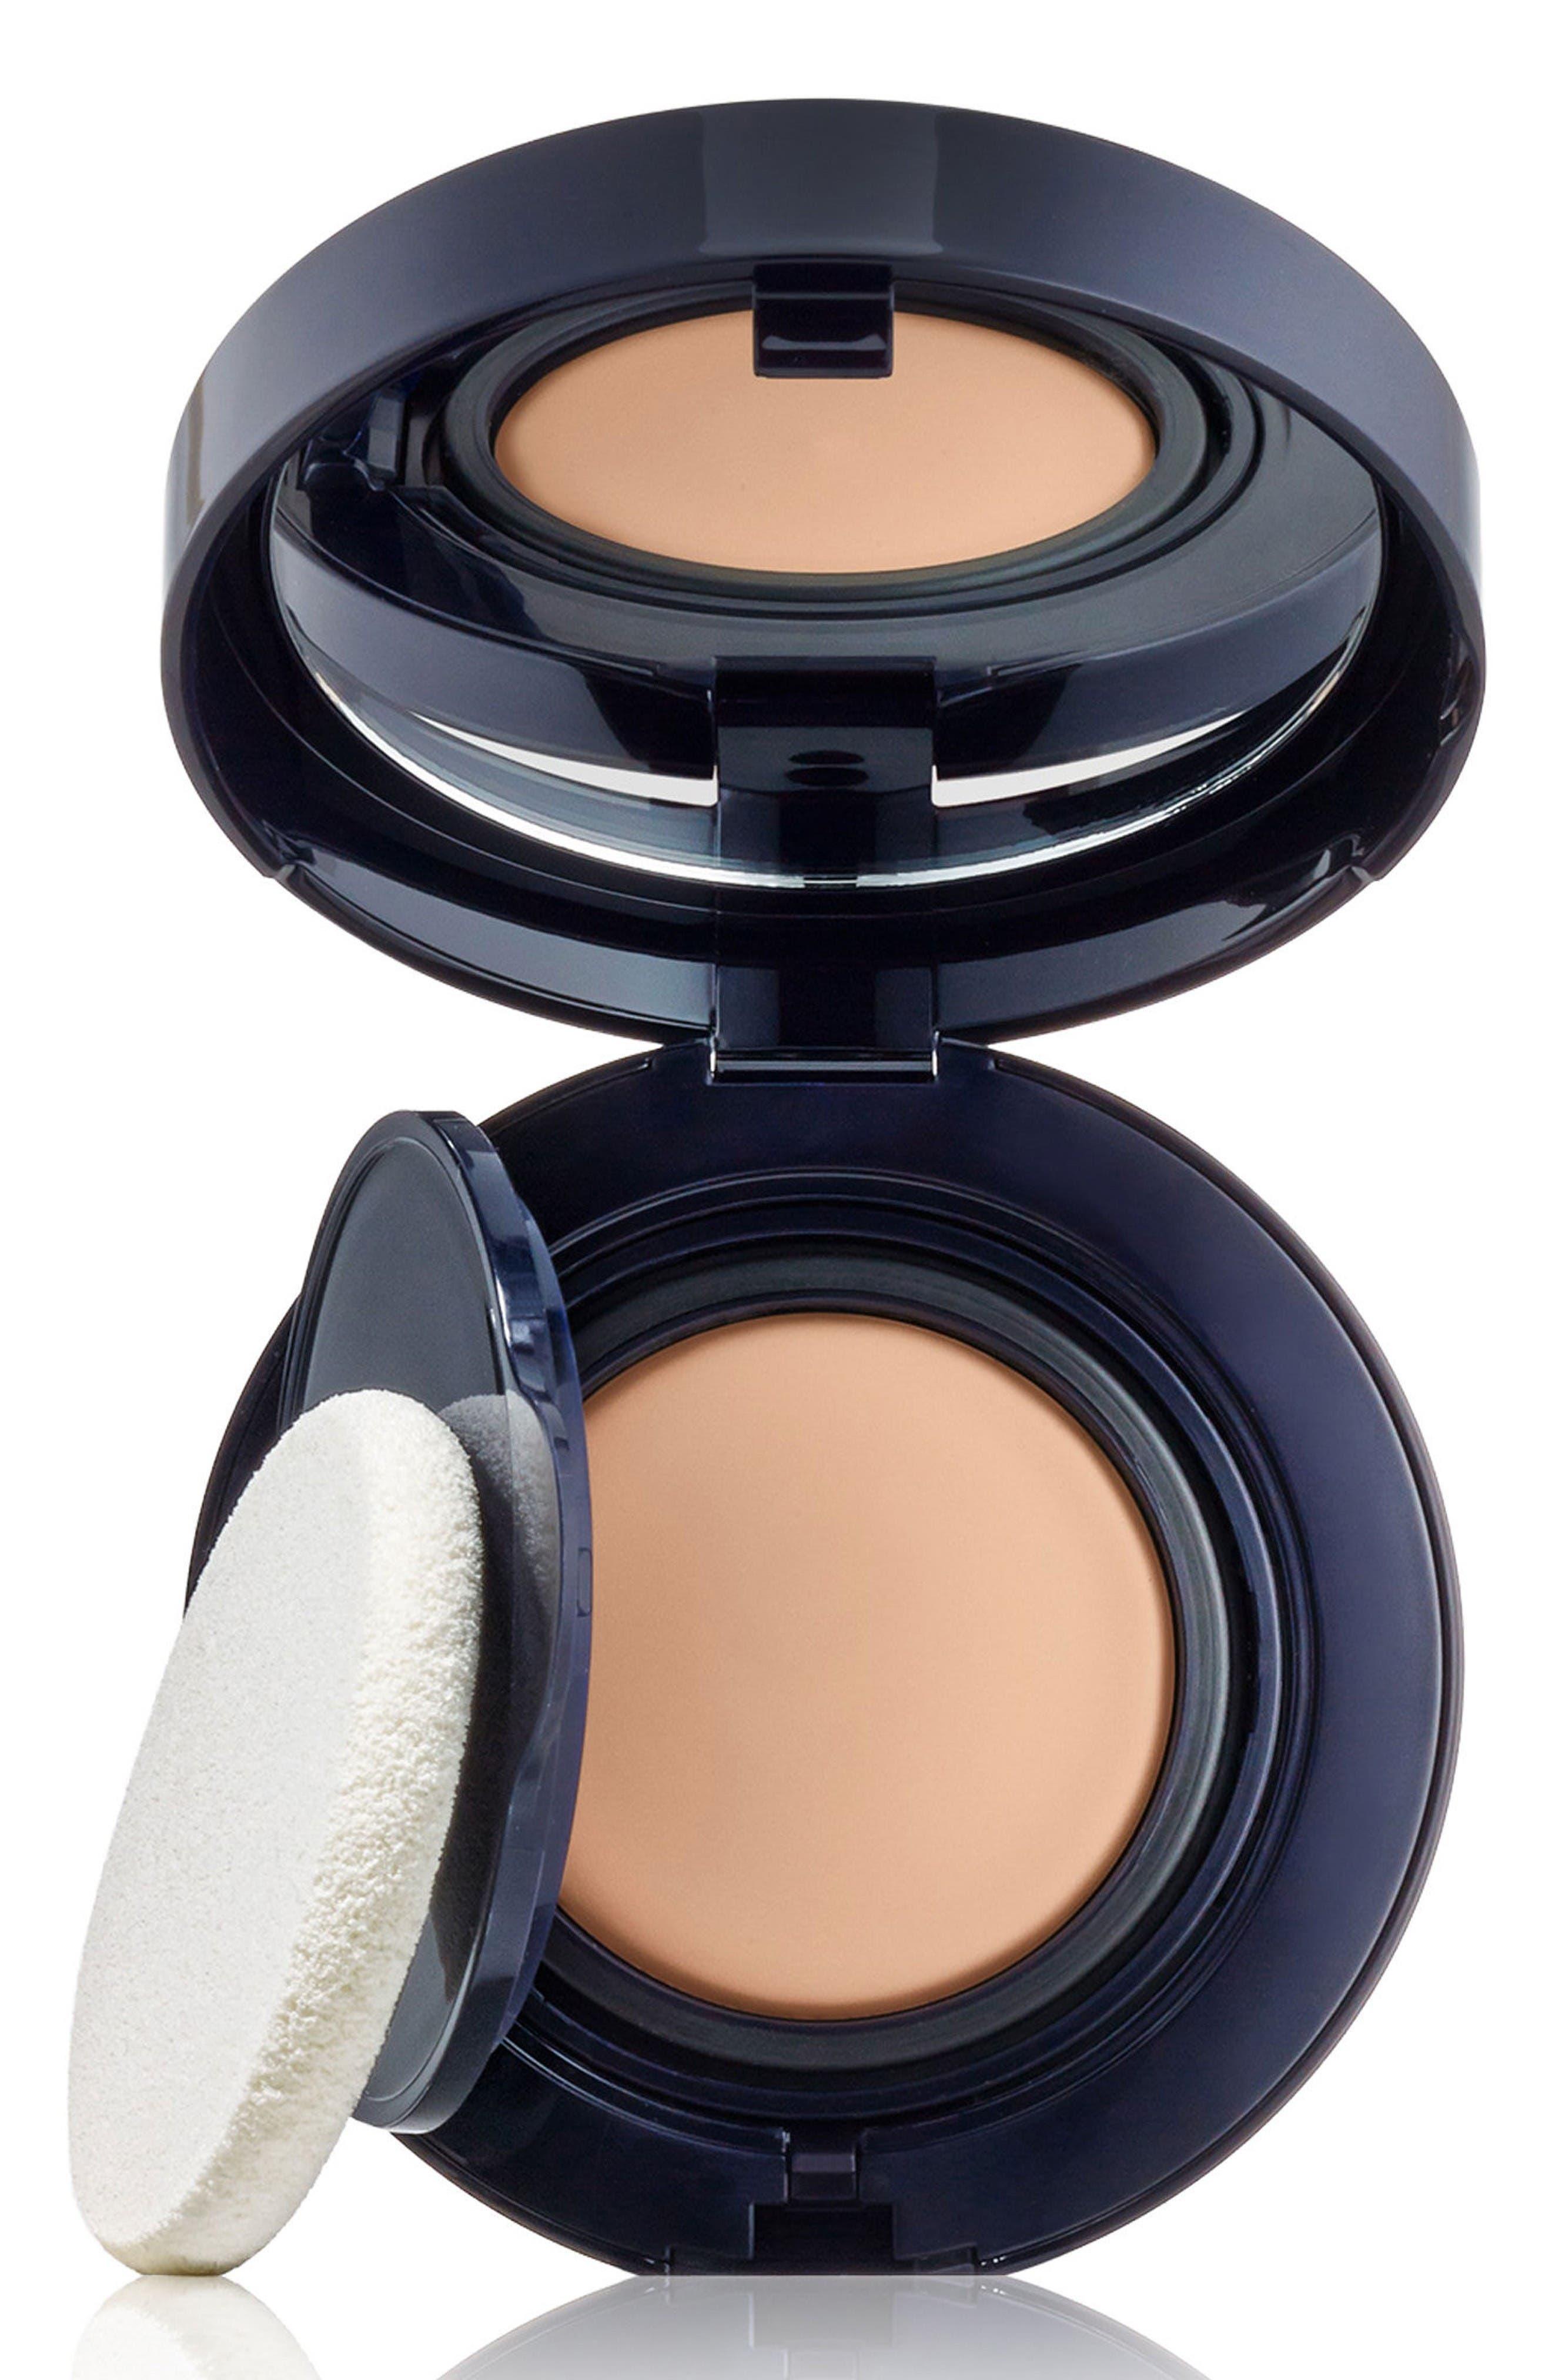 Alternate Image 1 Selected - Estée Lauder Perfectionist Serum Compact Makeup